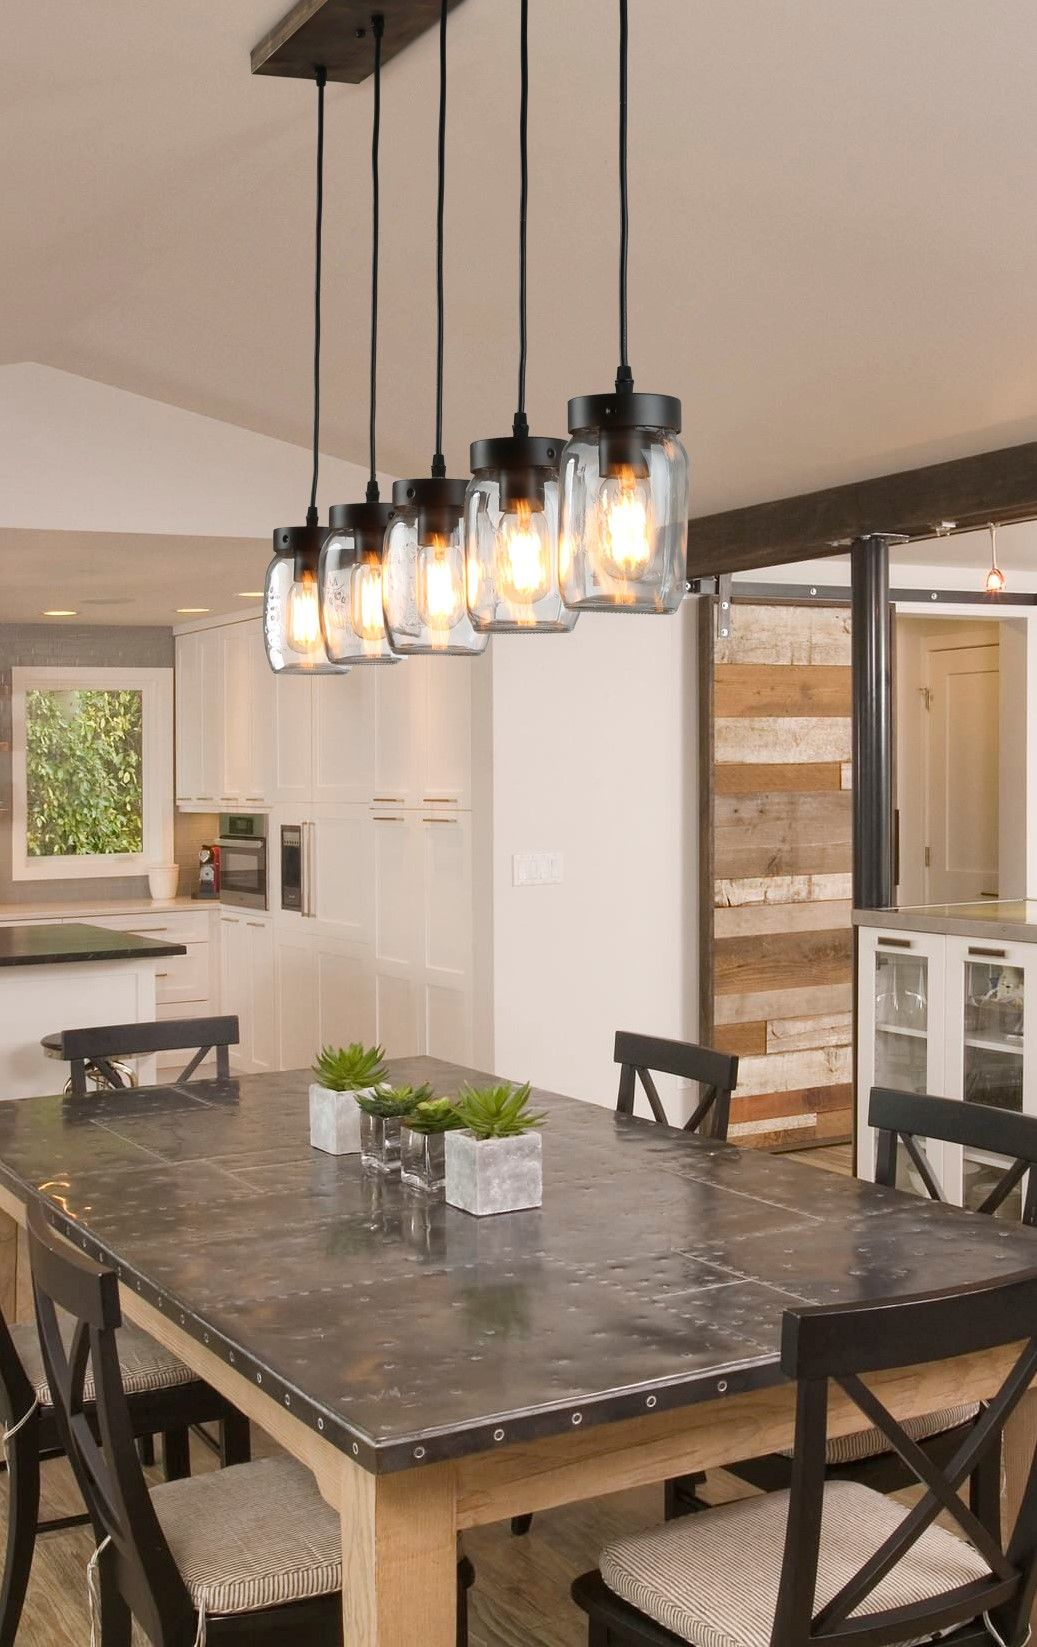 Linear Mason Jar Pendant 5 Lights Kitchen Table Lighting